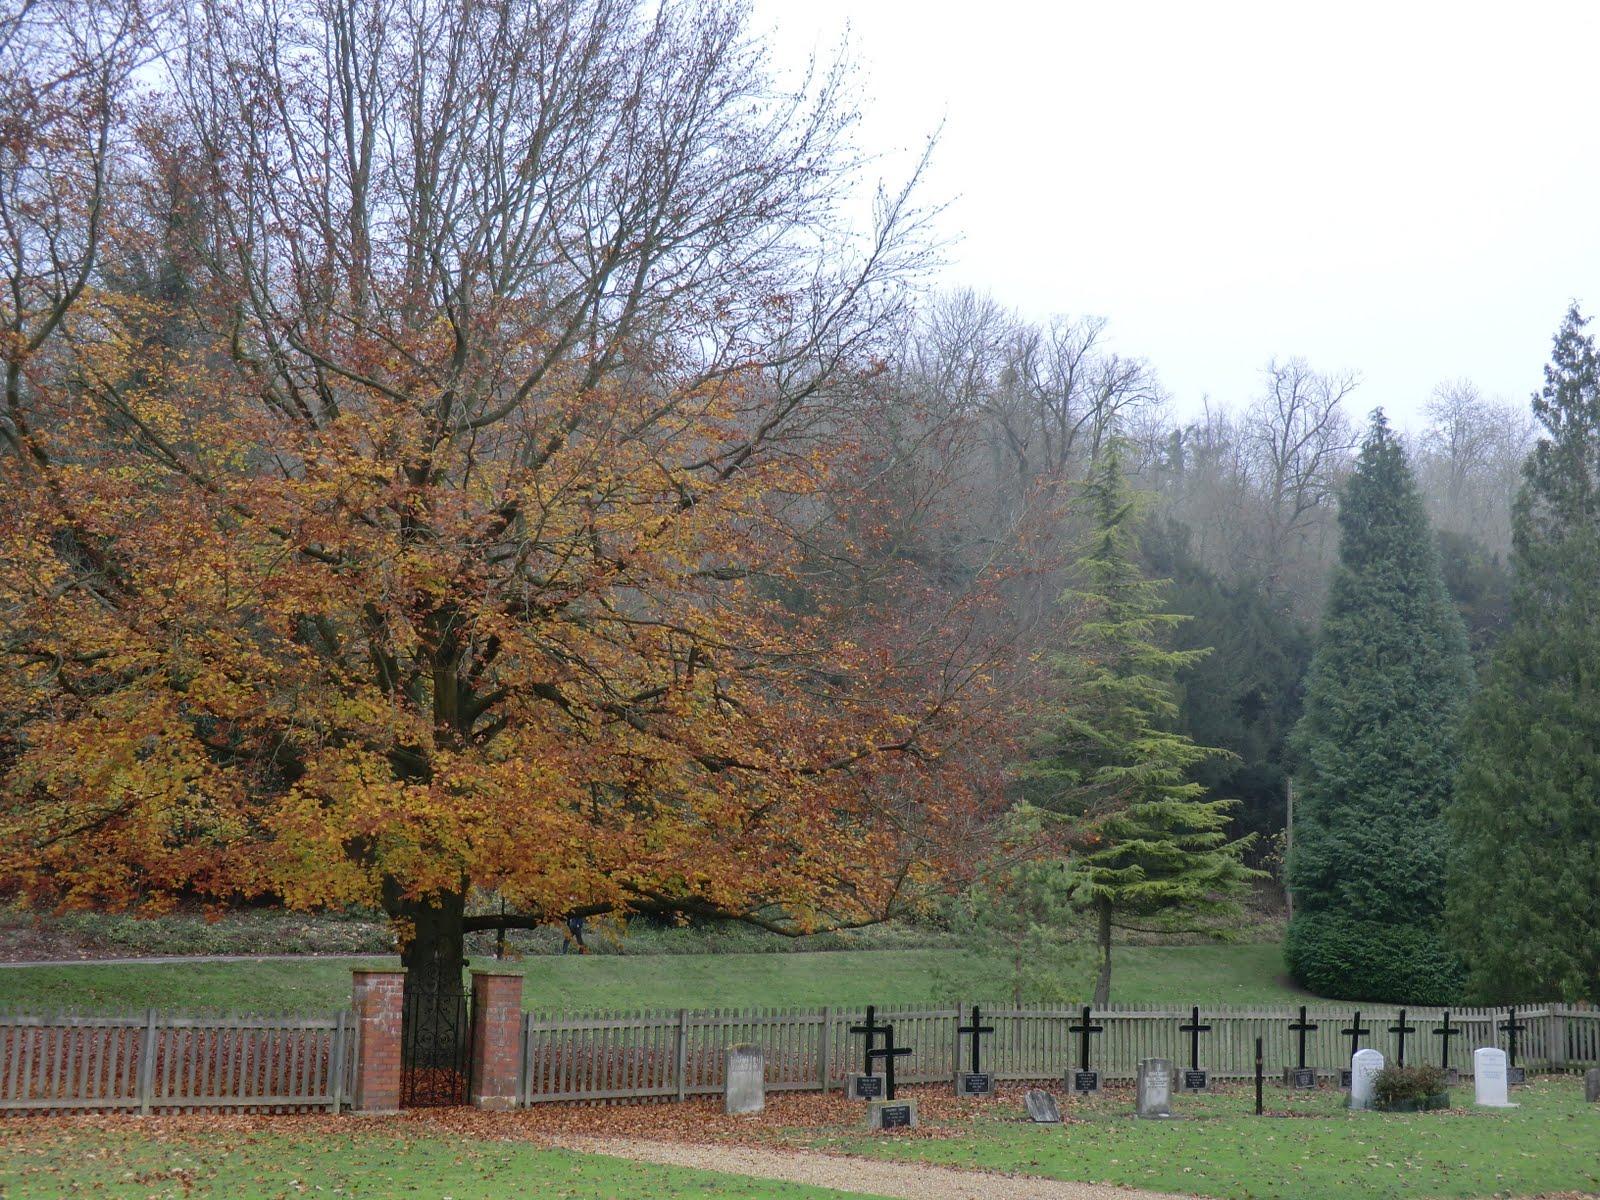 CIMG0309 Nun's cemetery, Woldingham School